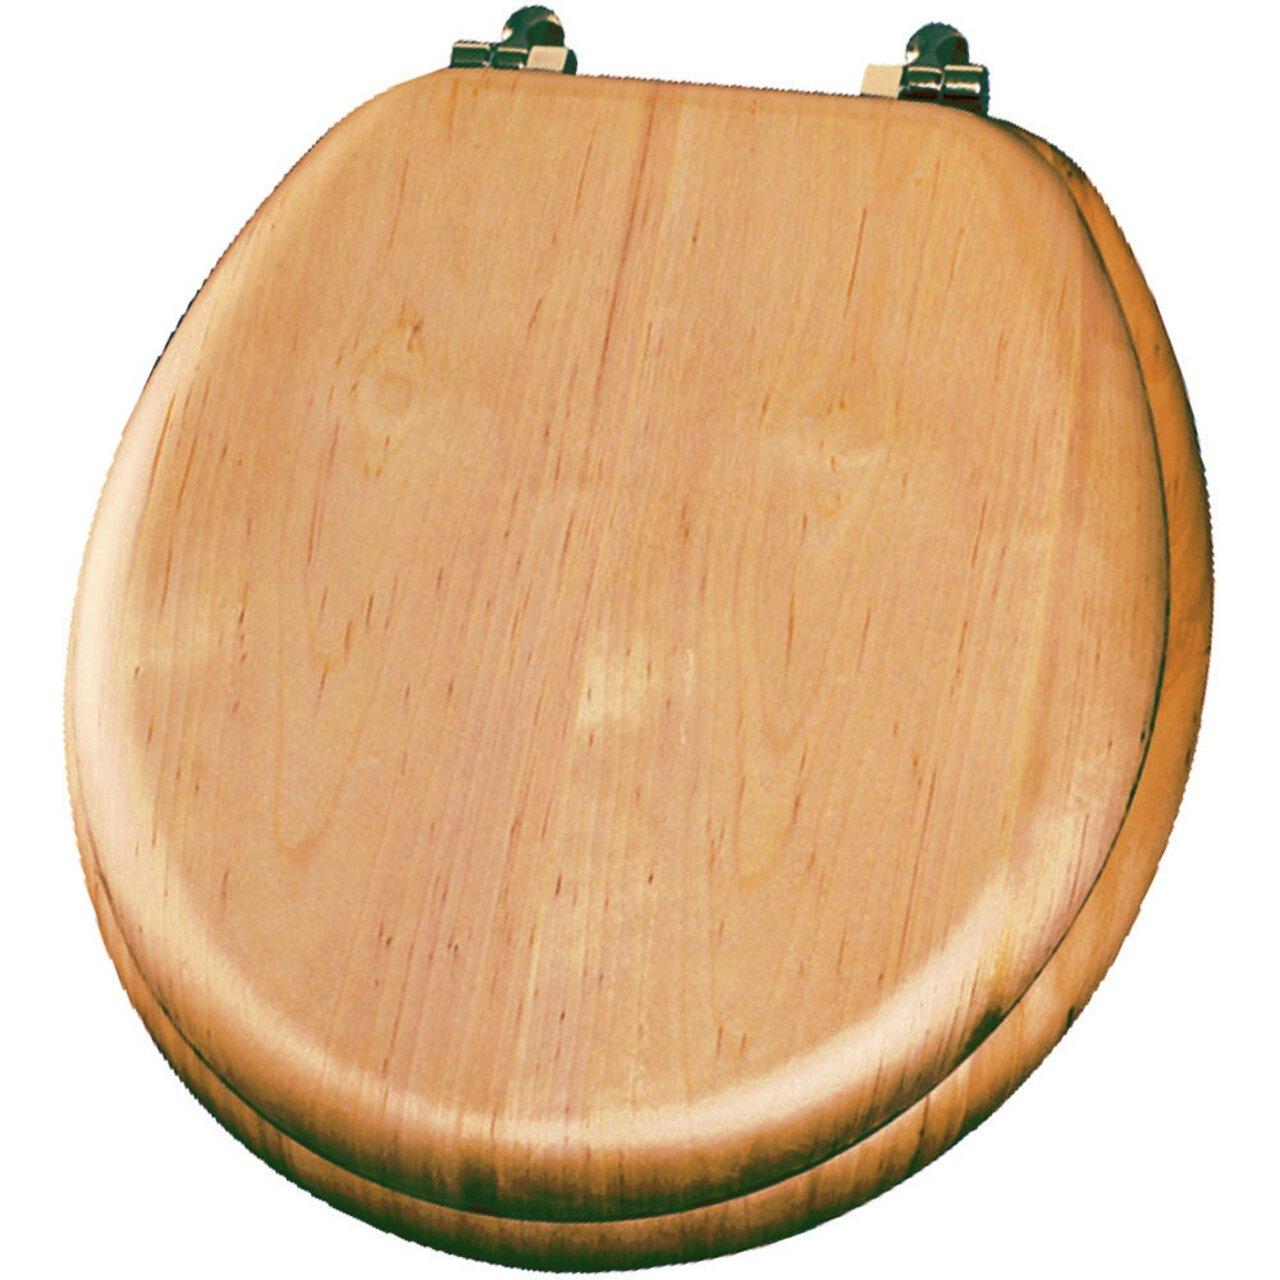 MAYFAIR Walnut Veneer Toilet Seat with Chrome Hinges, ELONGATED, 19601CP Bemis 19601CP 888